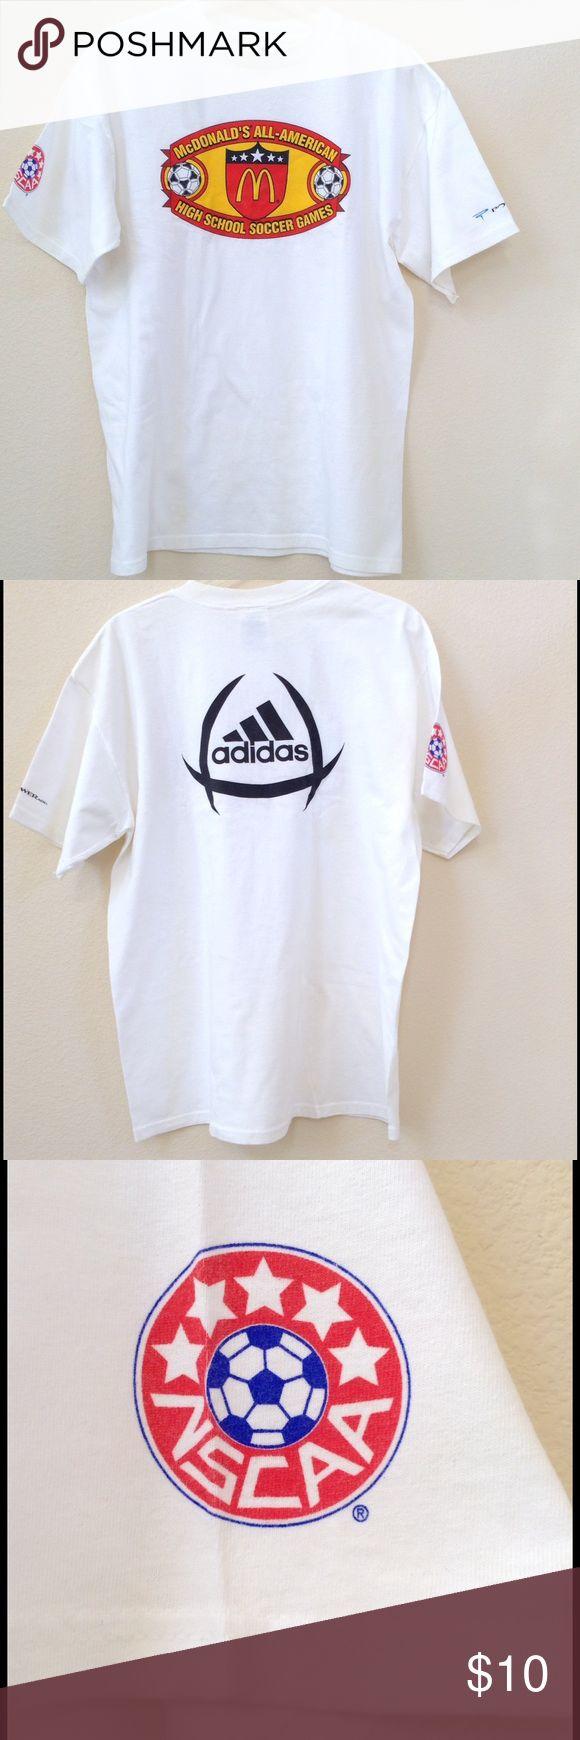 Men's Adidas Soccer TShirt McDonalds All American soccer Adidas TShirt.   100% cotton. No year date! Adidas Shirts Tees - Short Sleeve